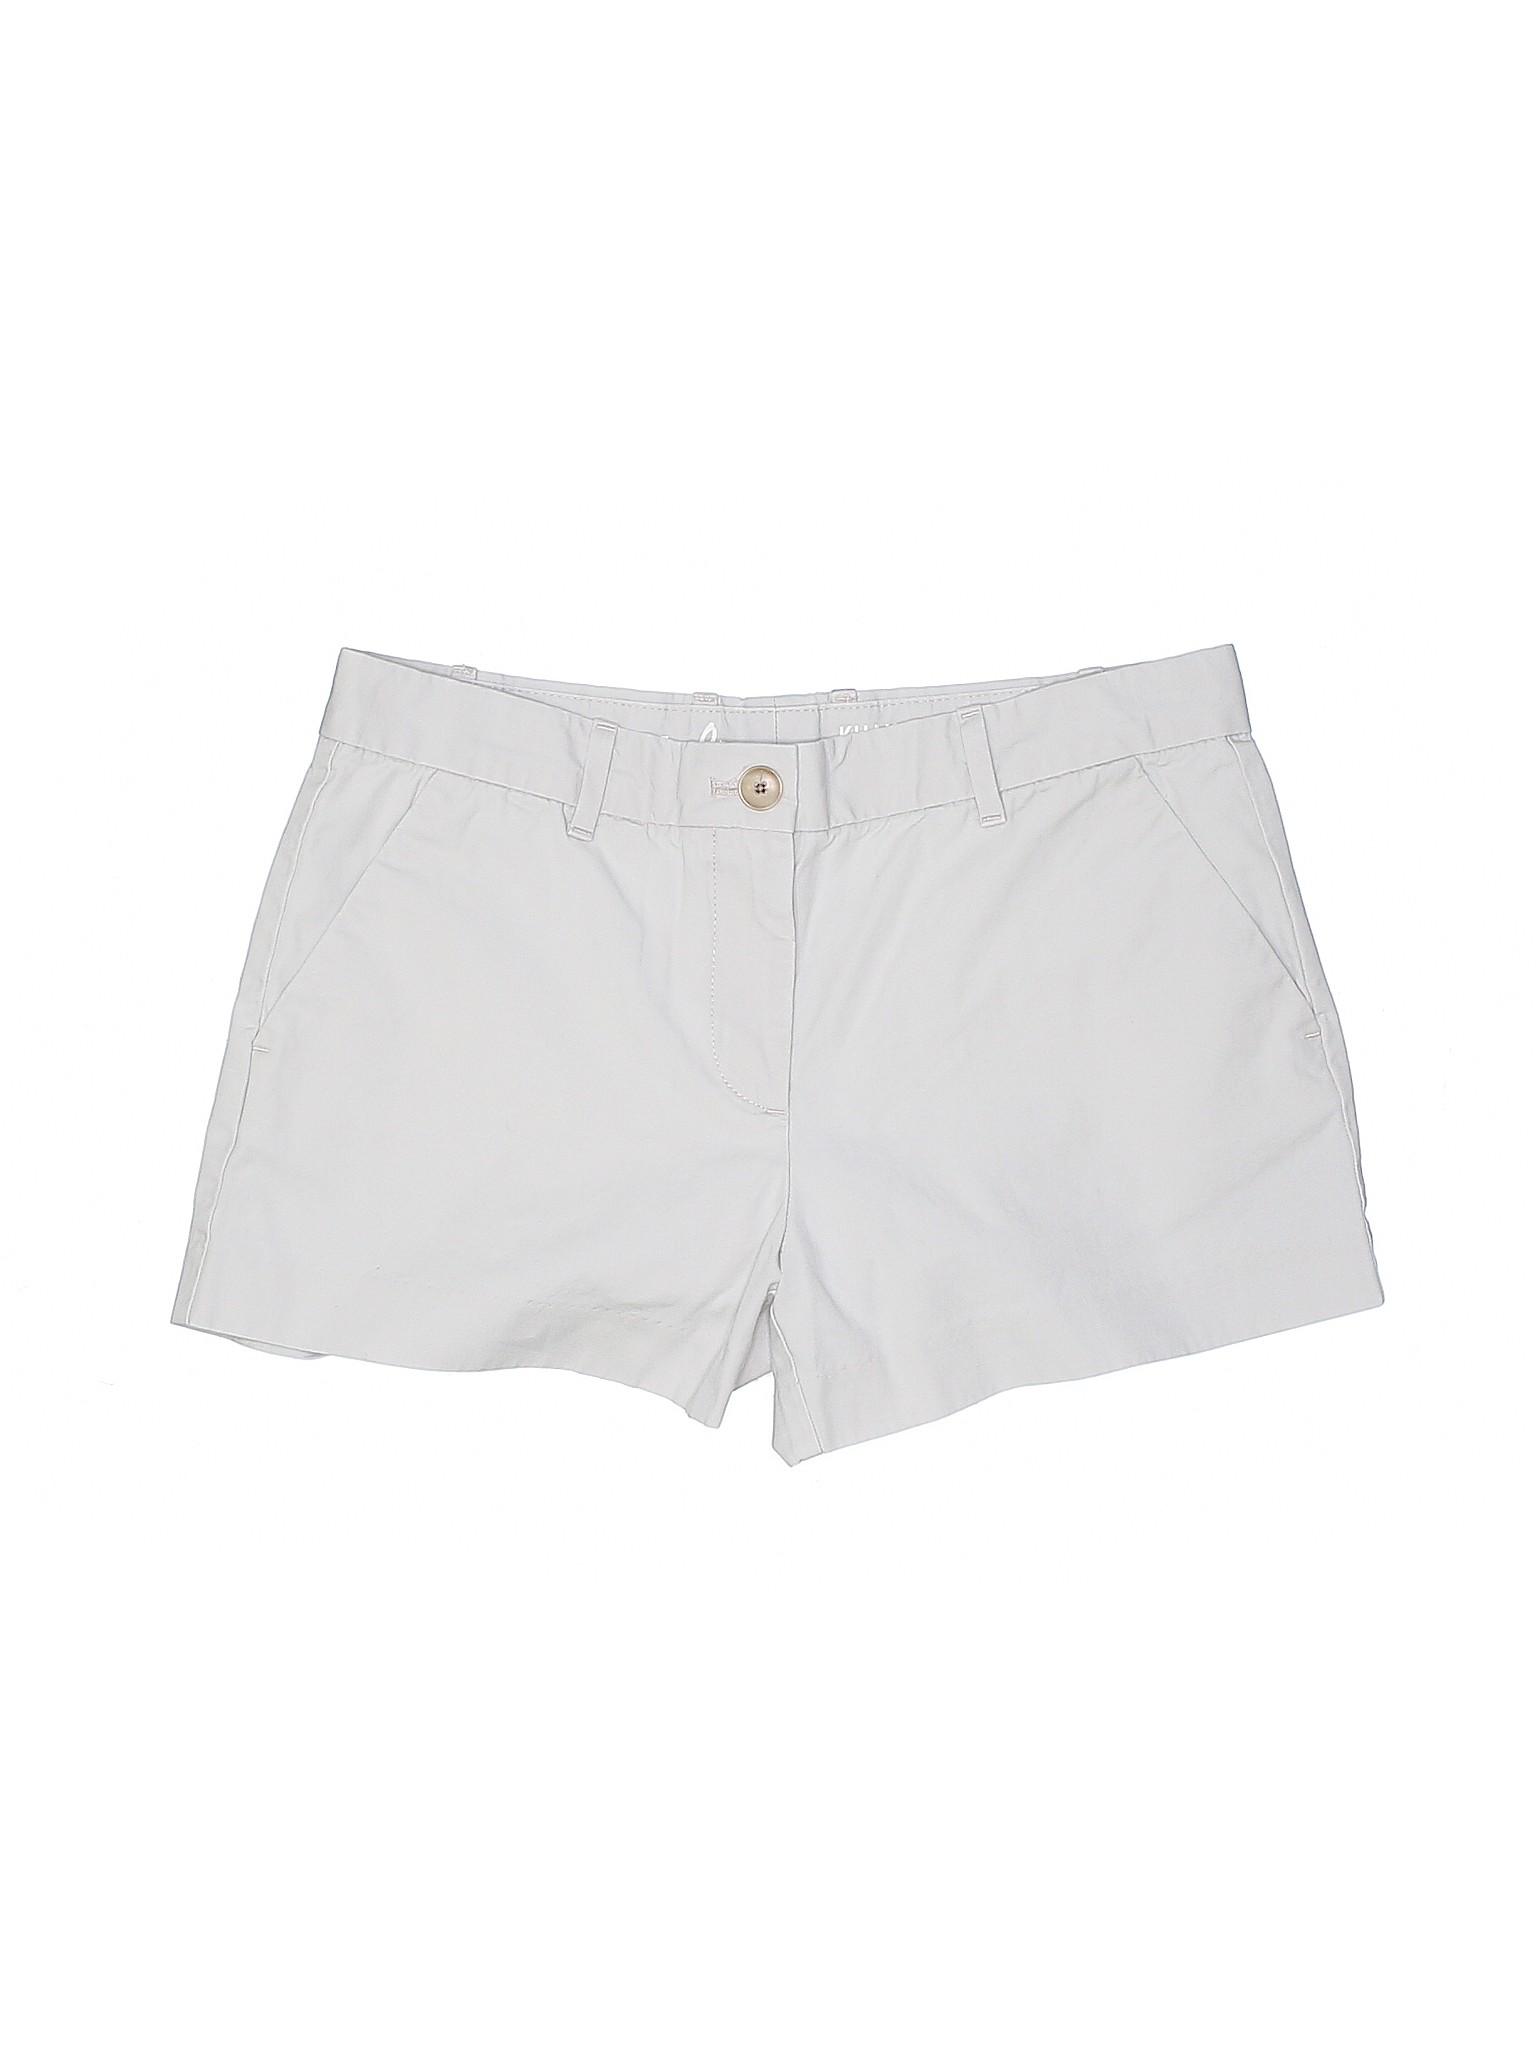 Boutique Khaki Khaki Gap Boutique Gap Gap Shorts Khaki Shorts Boutique Khaki Boutique Shorts Gap wZqw1